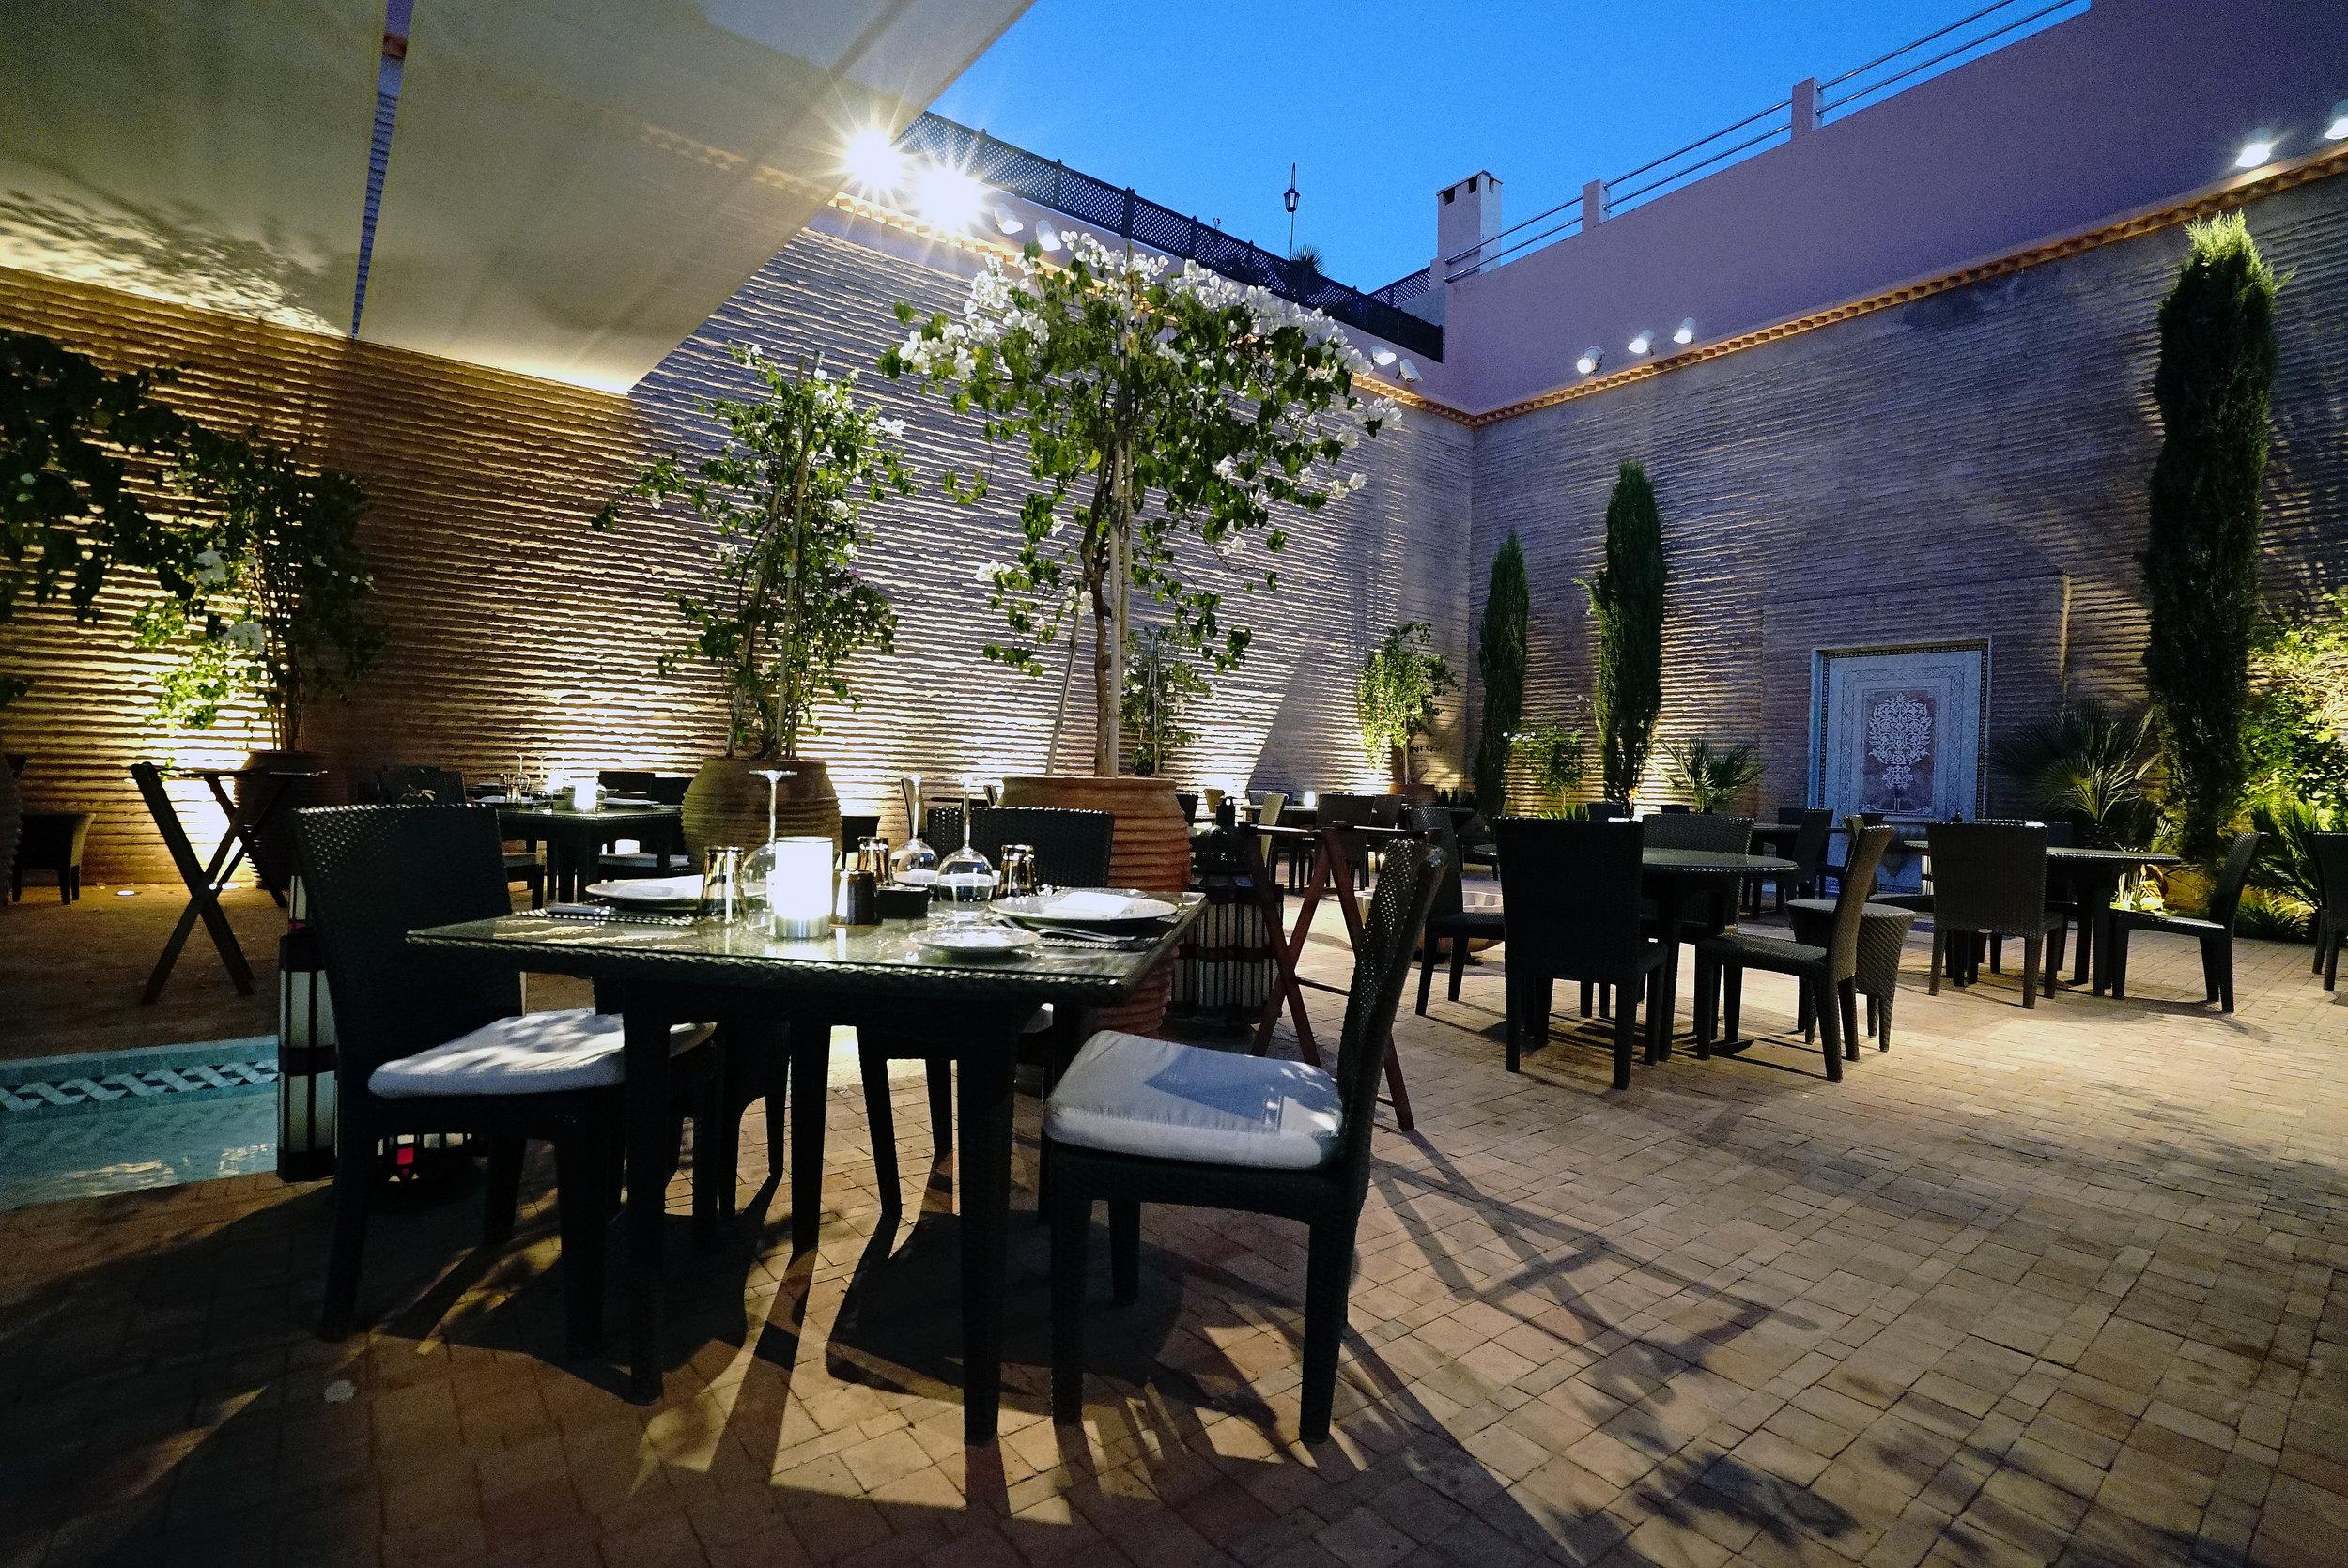 La Mamounia Morocco Dining.jpg